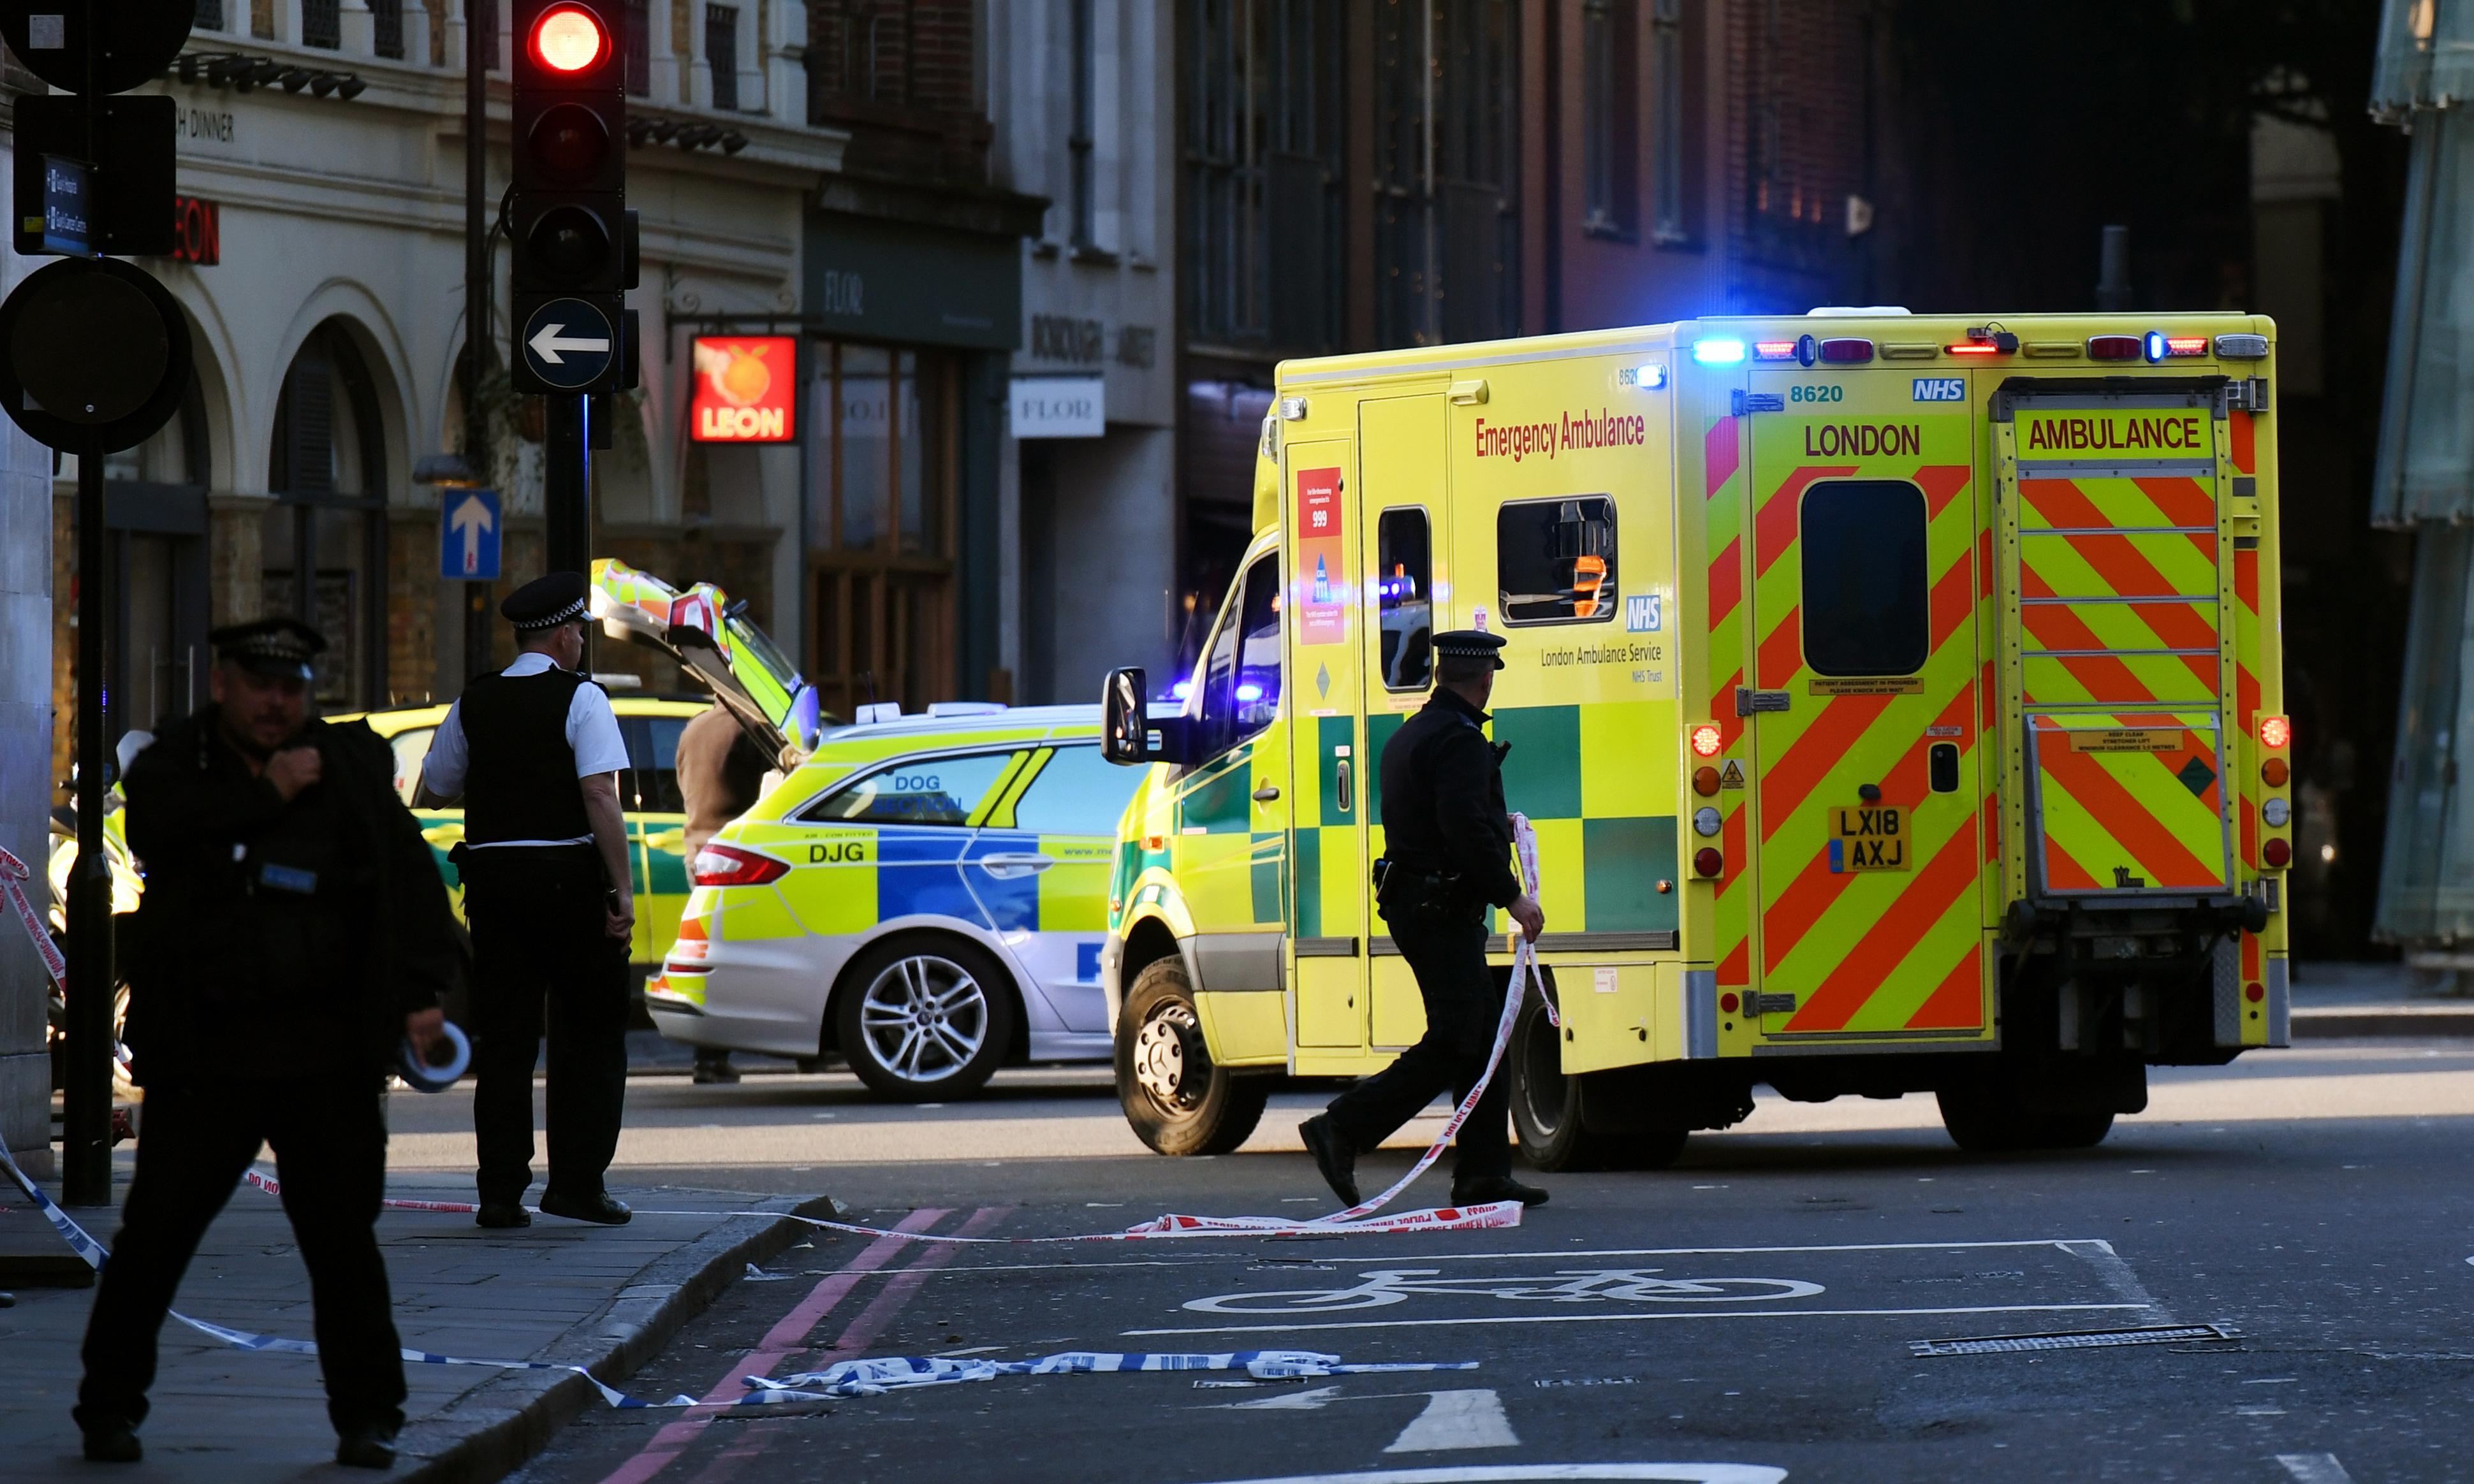 First London Bridge attack victim named as Jack Merritt